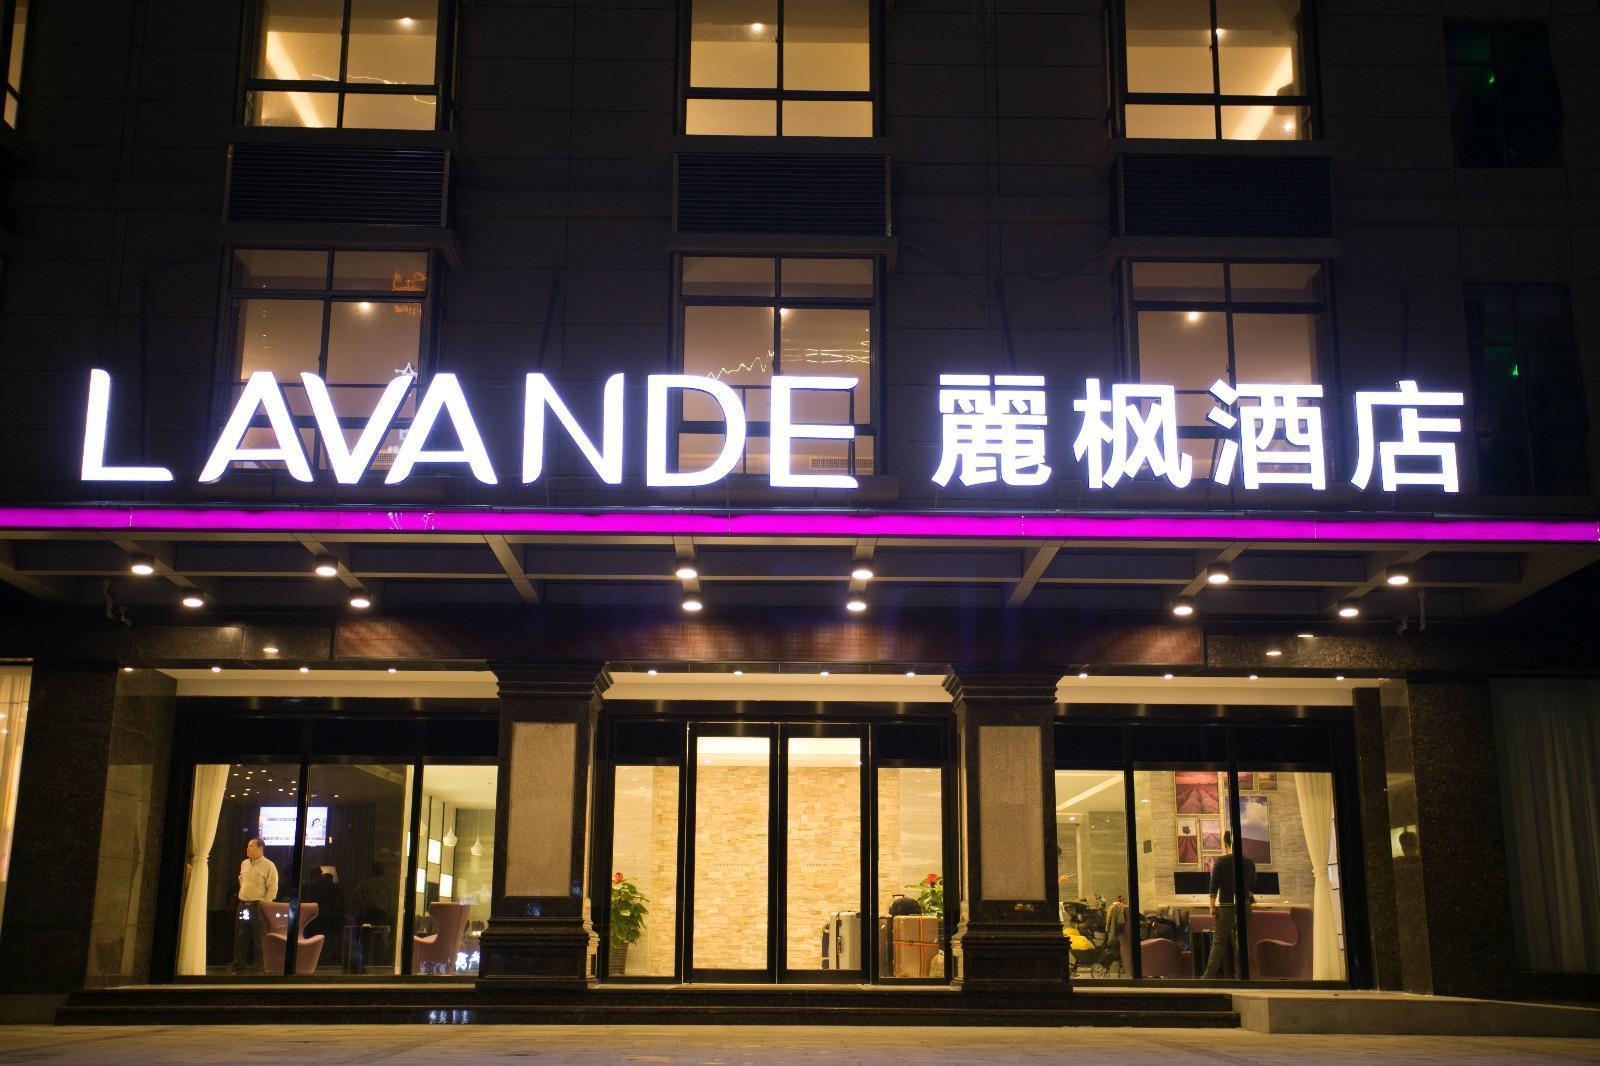 Lavande Hotels�Qionghai Boao